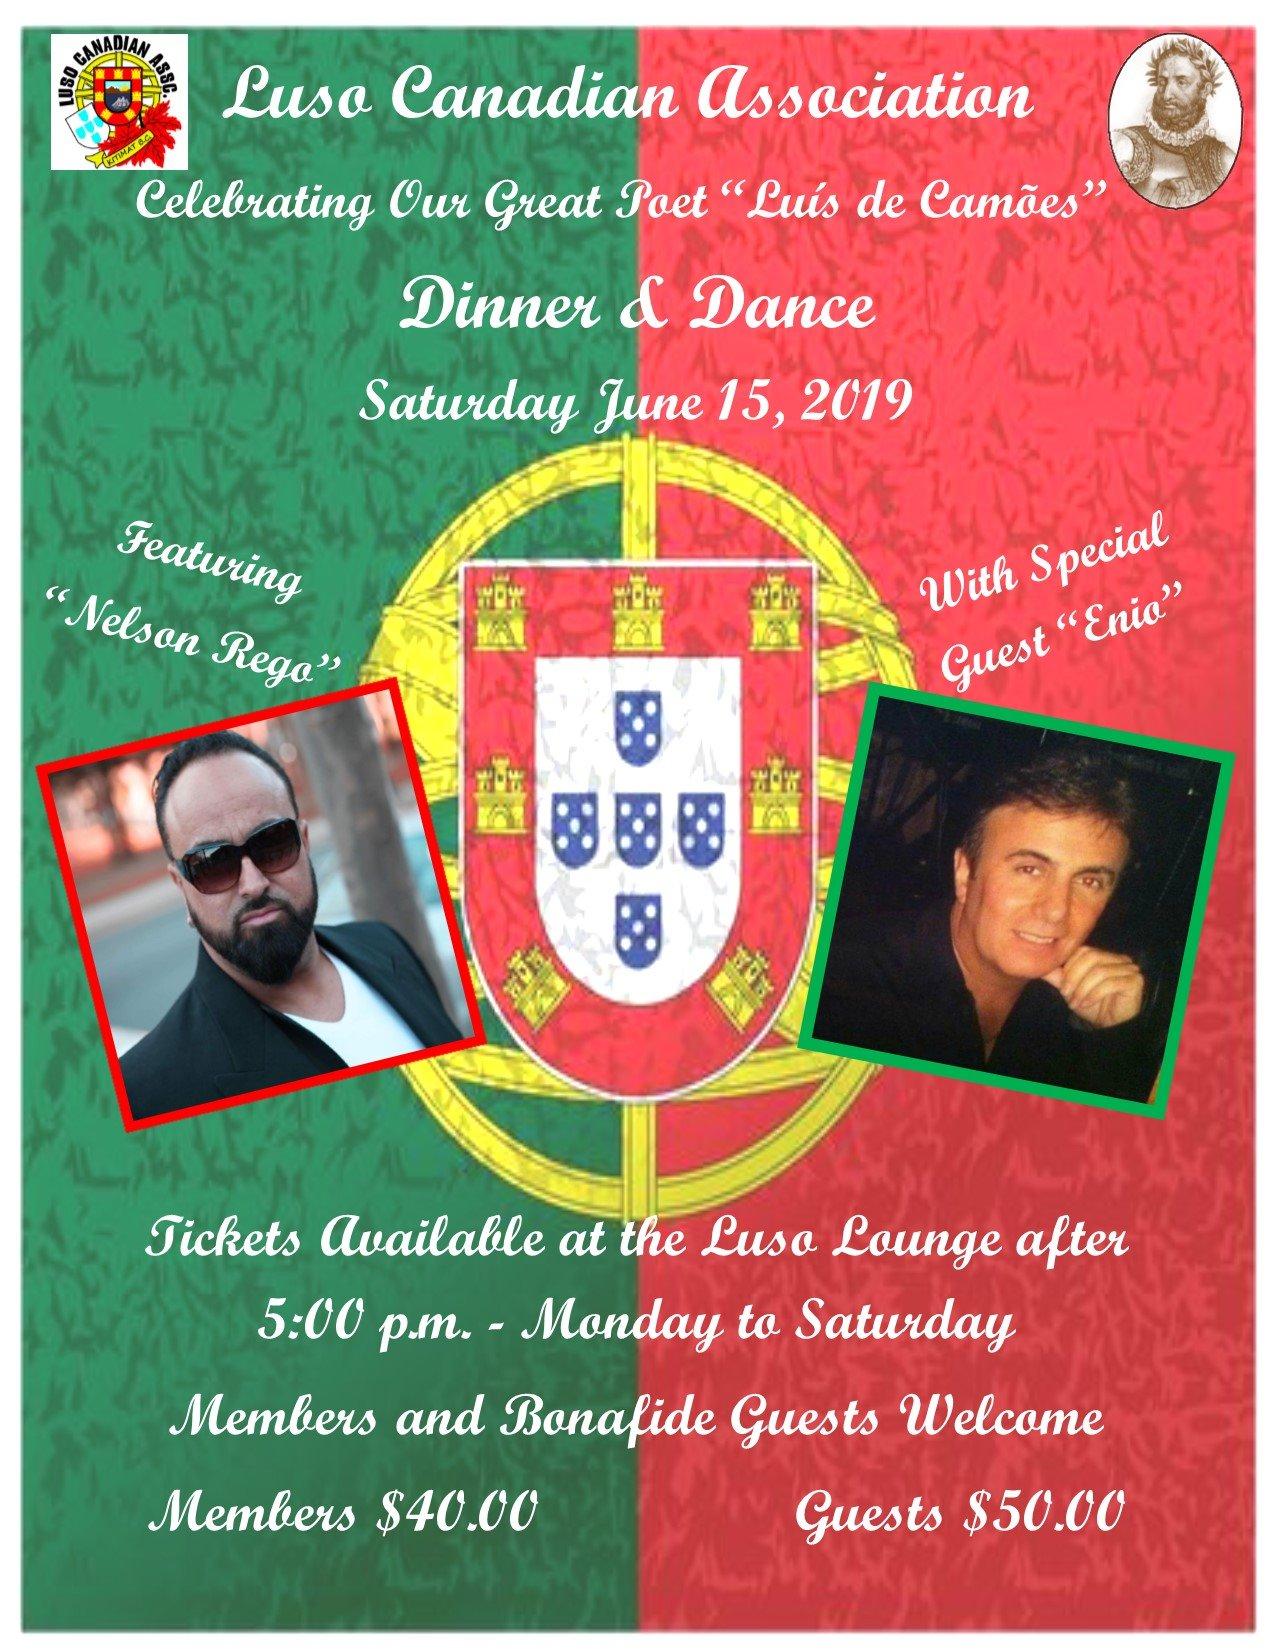 Luso Canadian Association, Luis de Camões Dinner and Dance, Kitimat